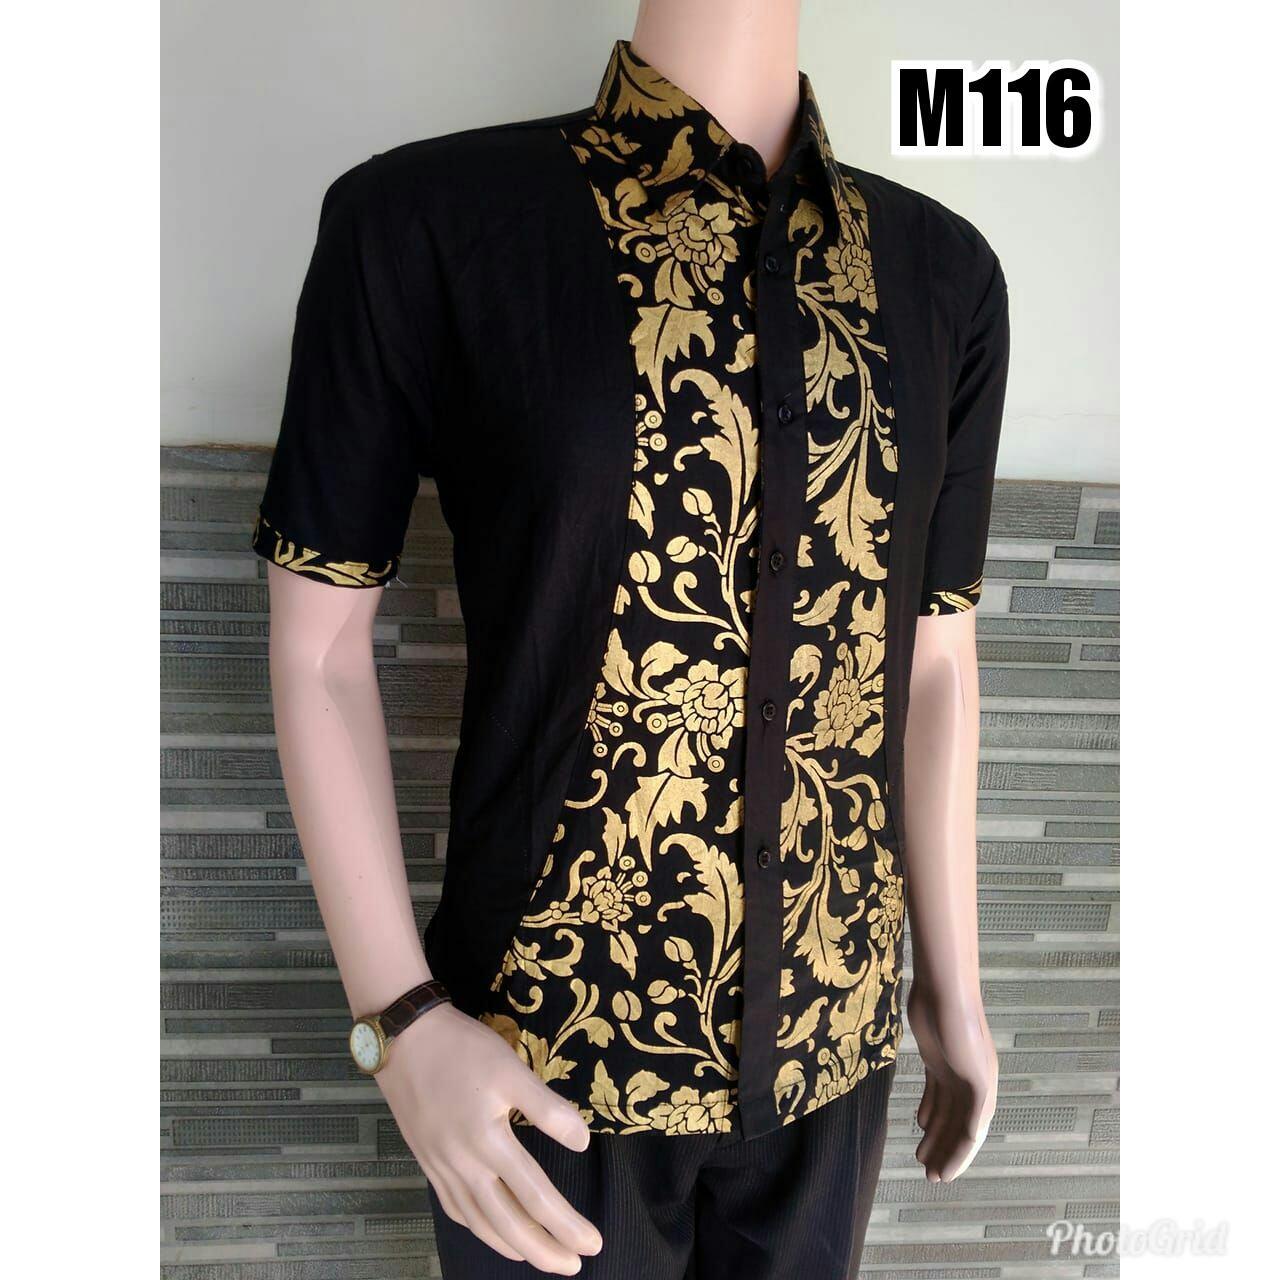 TERMURAH - Hem Batik Pria – Kemeja Batik - Baju Batik- Kemeja Pekalongan – Hem Batik Modern –